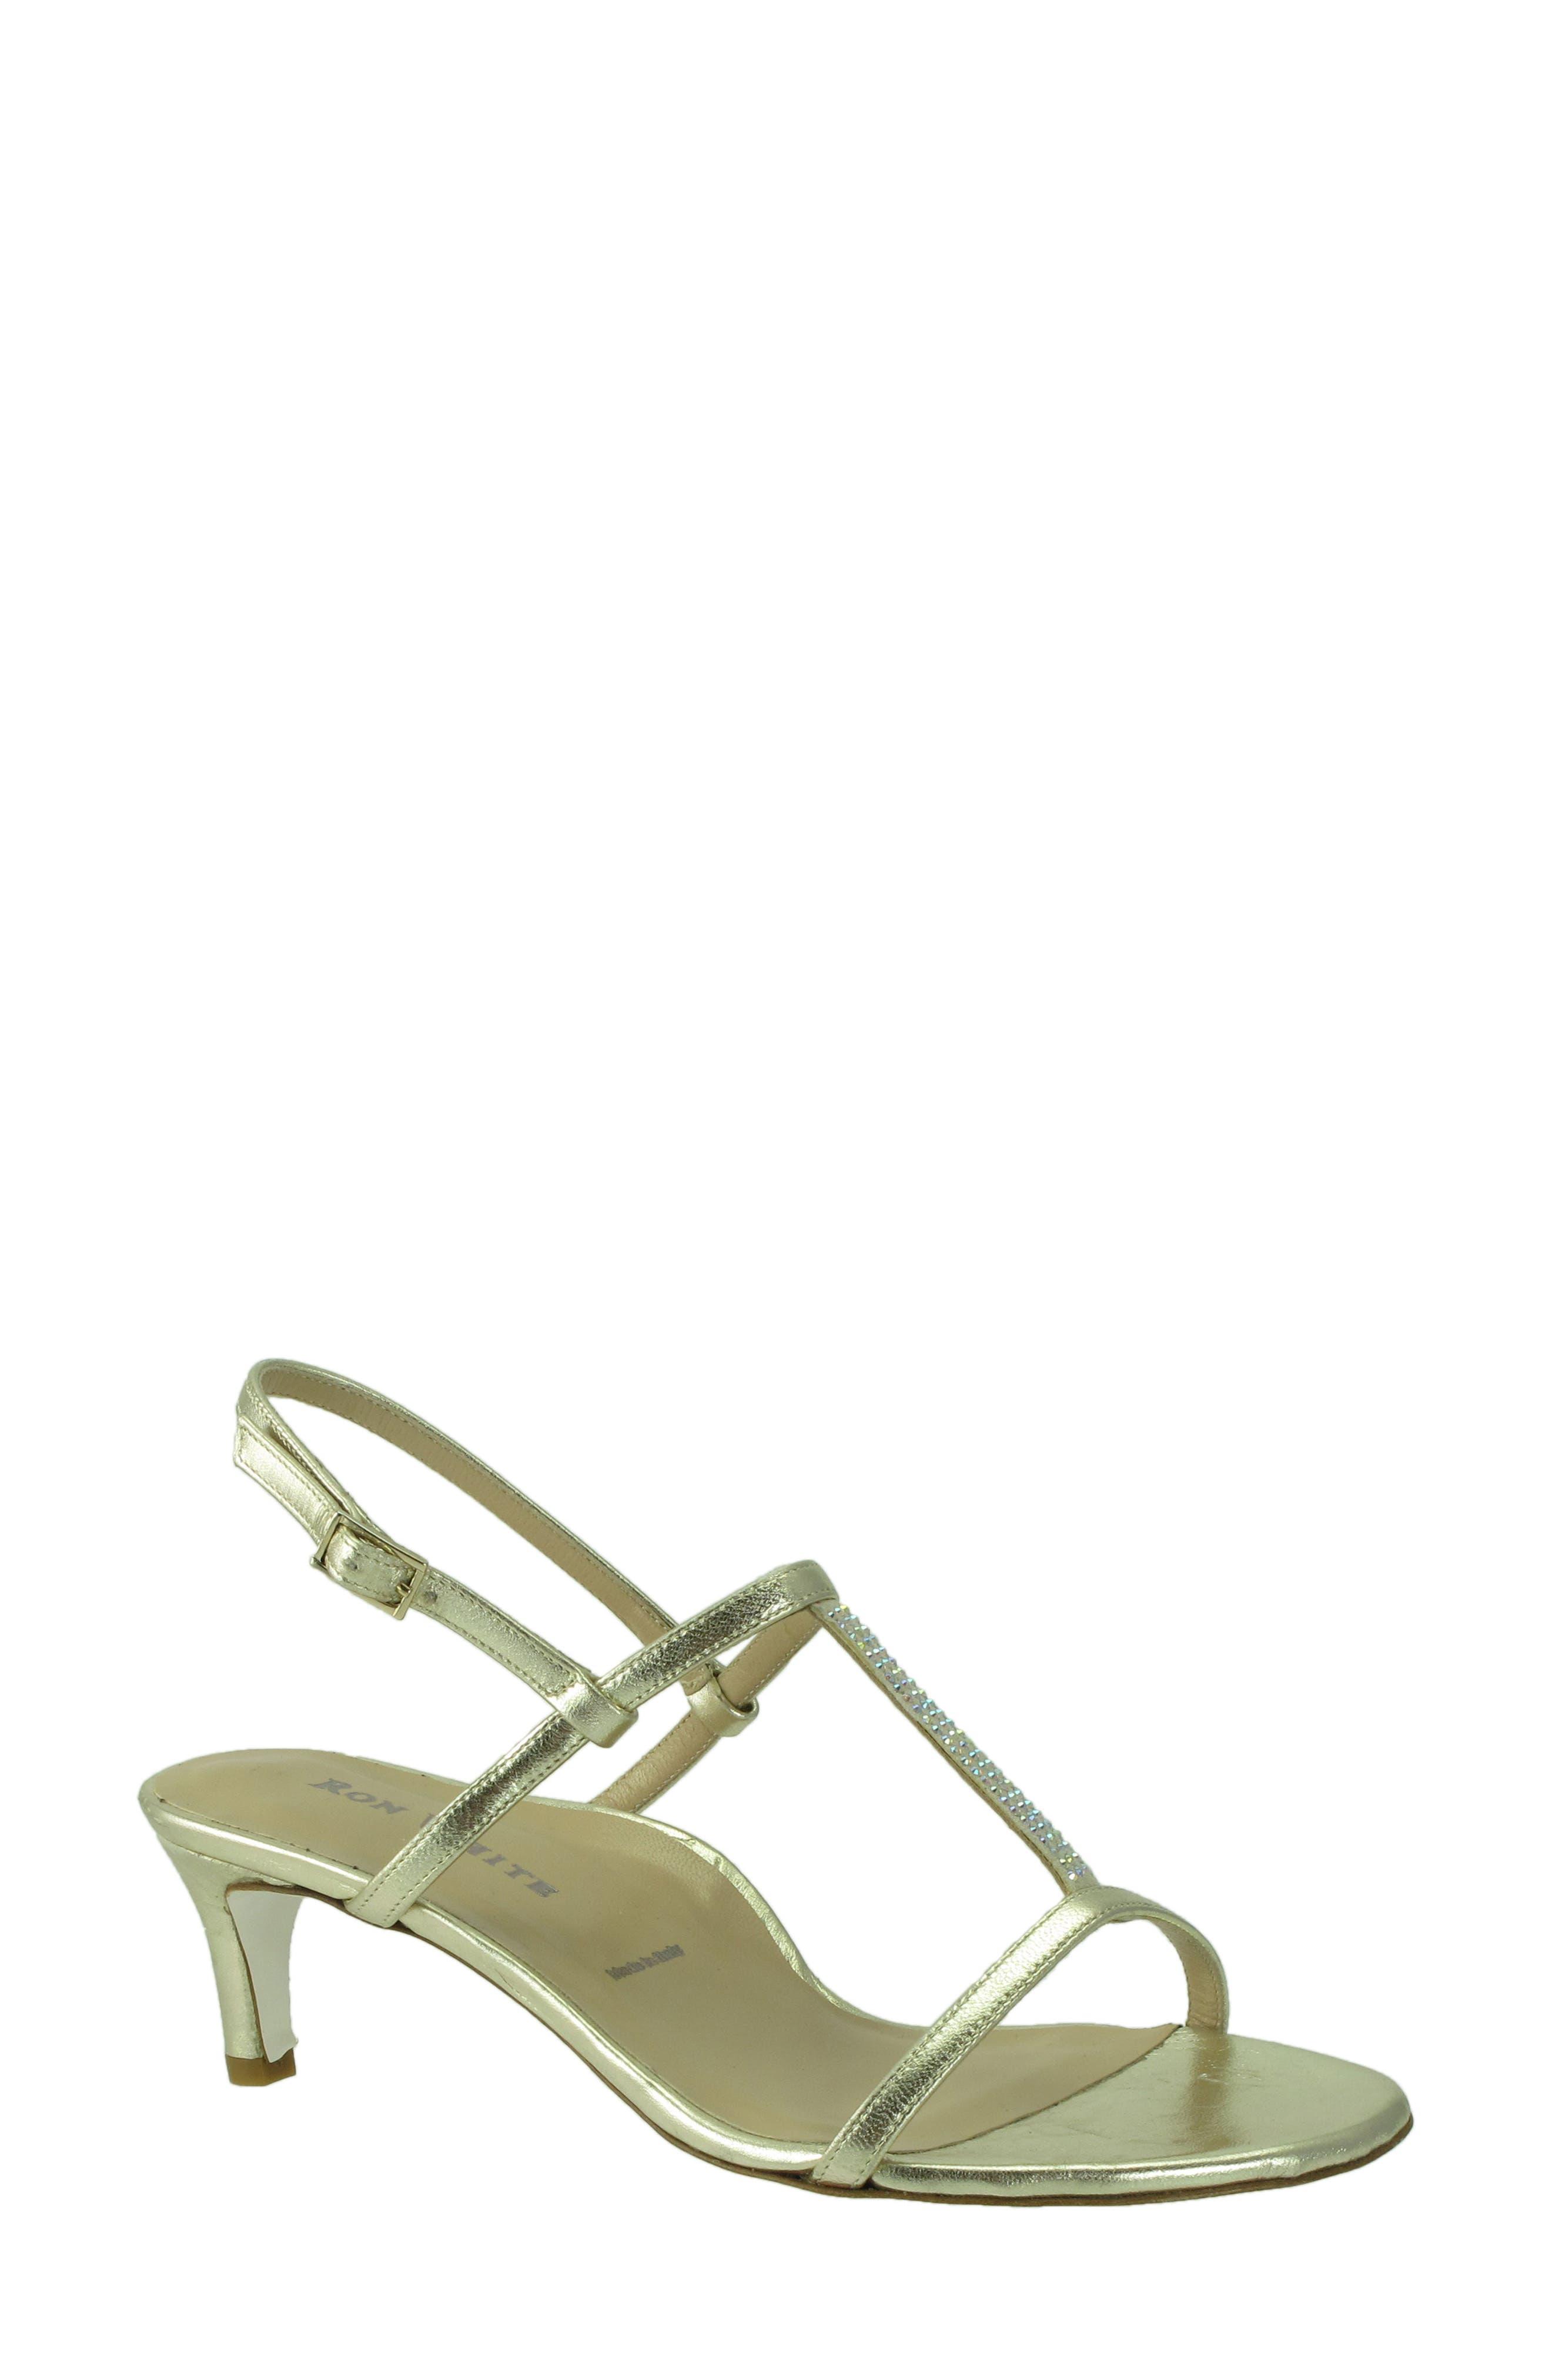 Floto Sandal,                             Main thumbnail 1, color,                             Platino Leather